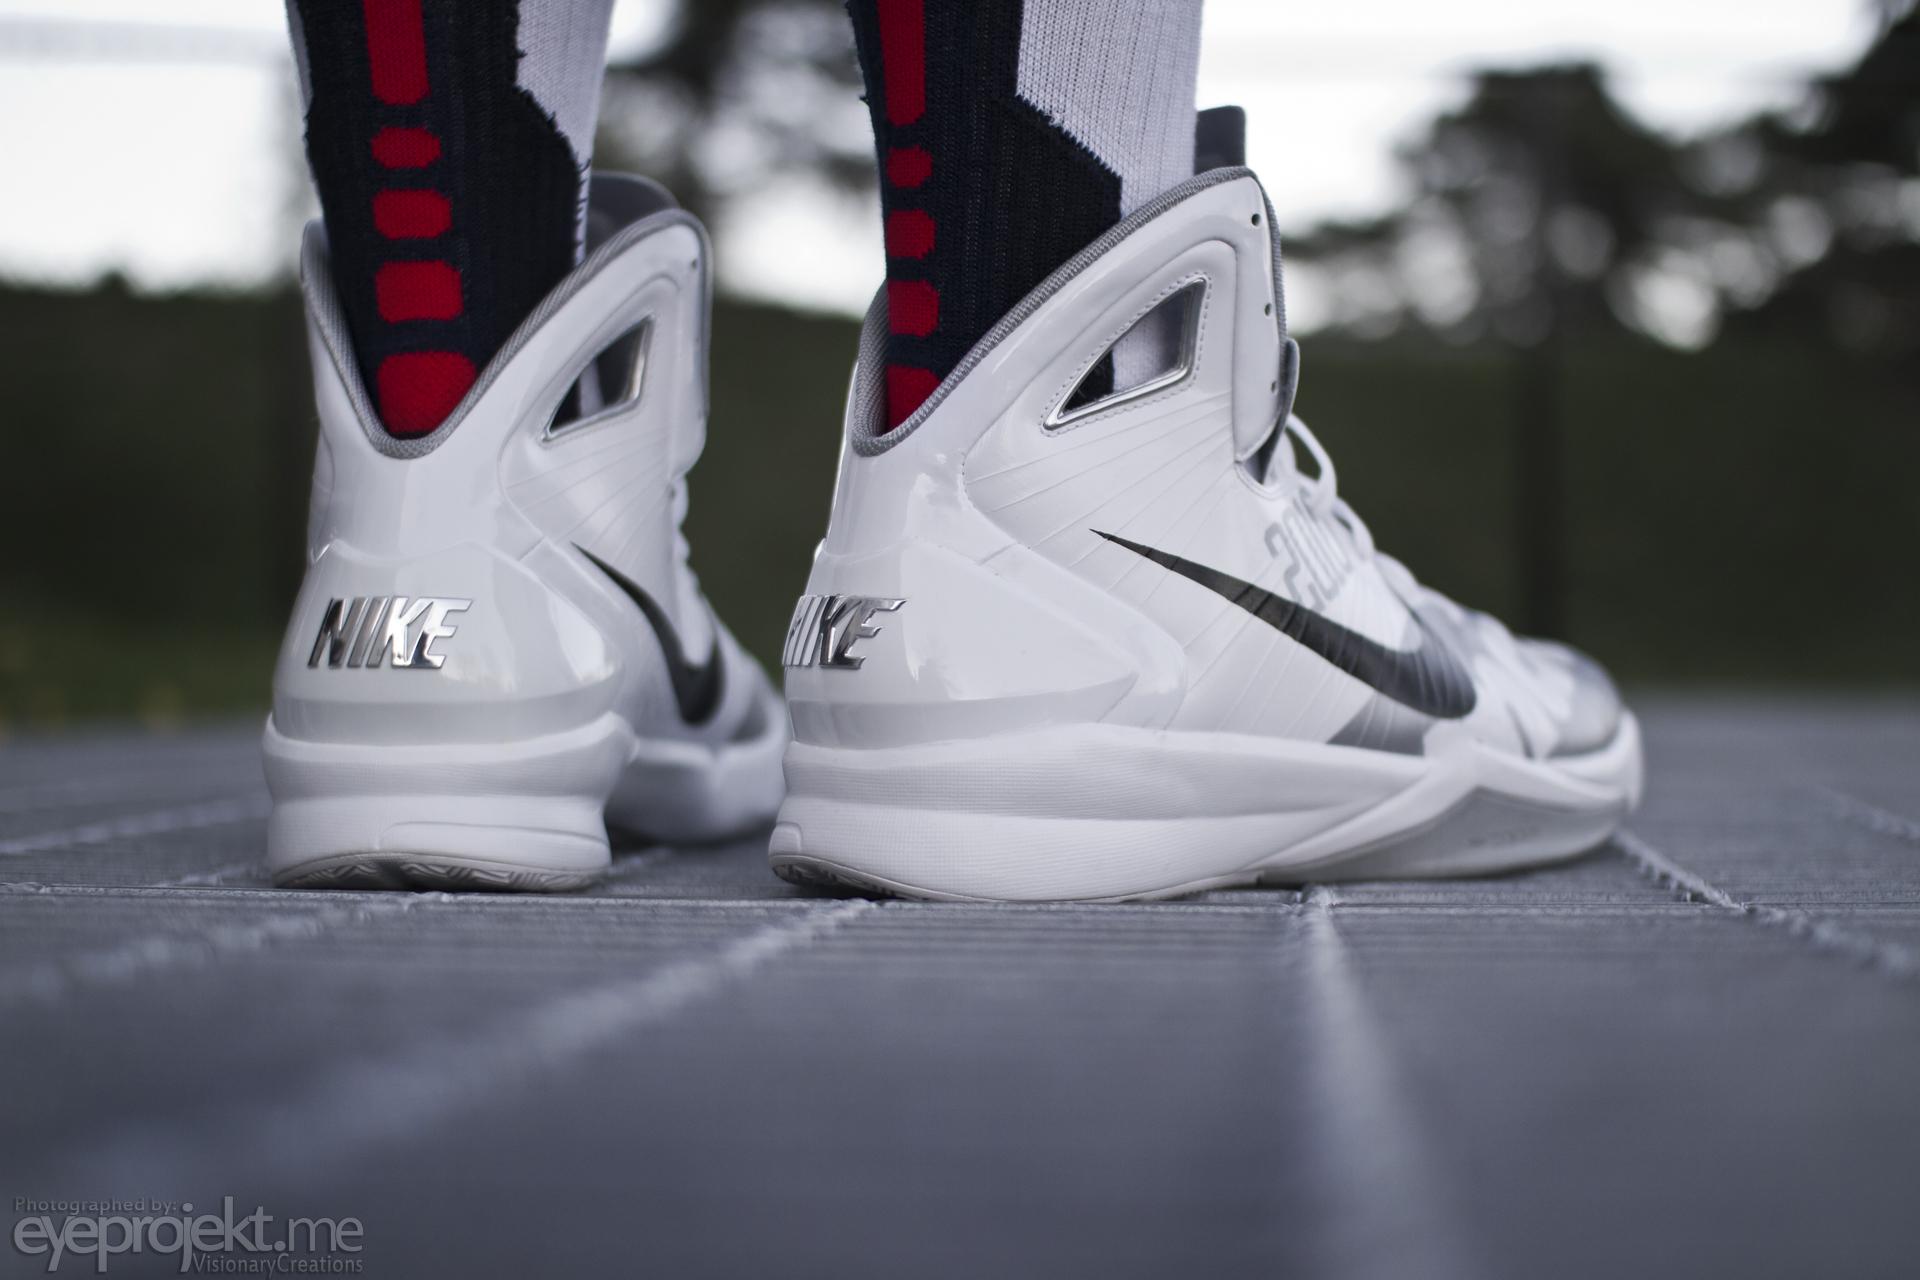 Nike Hyperdunk '10 Maui PE